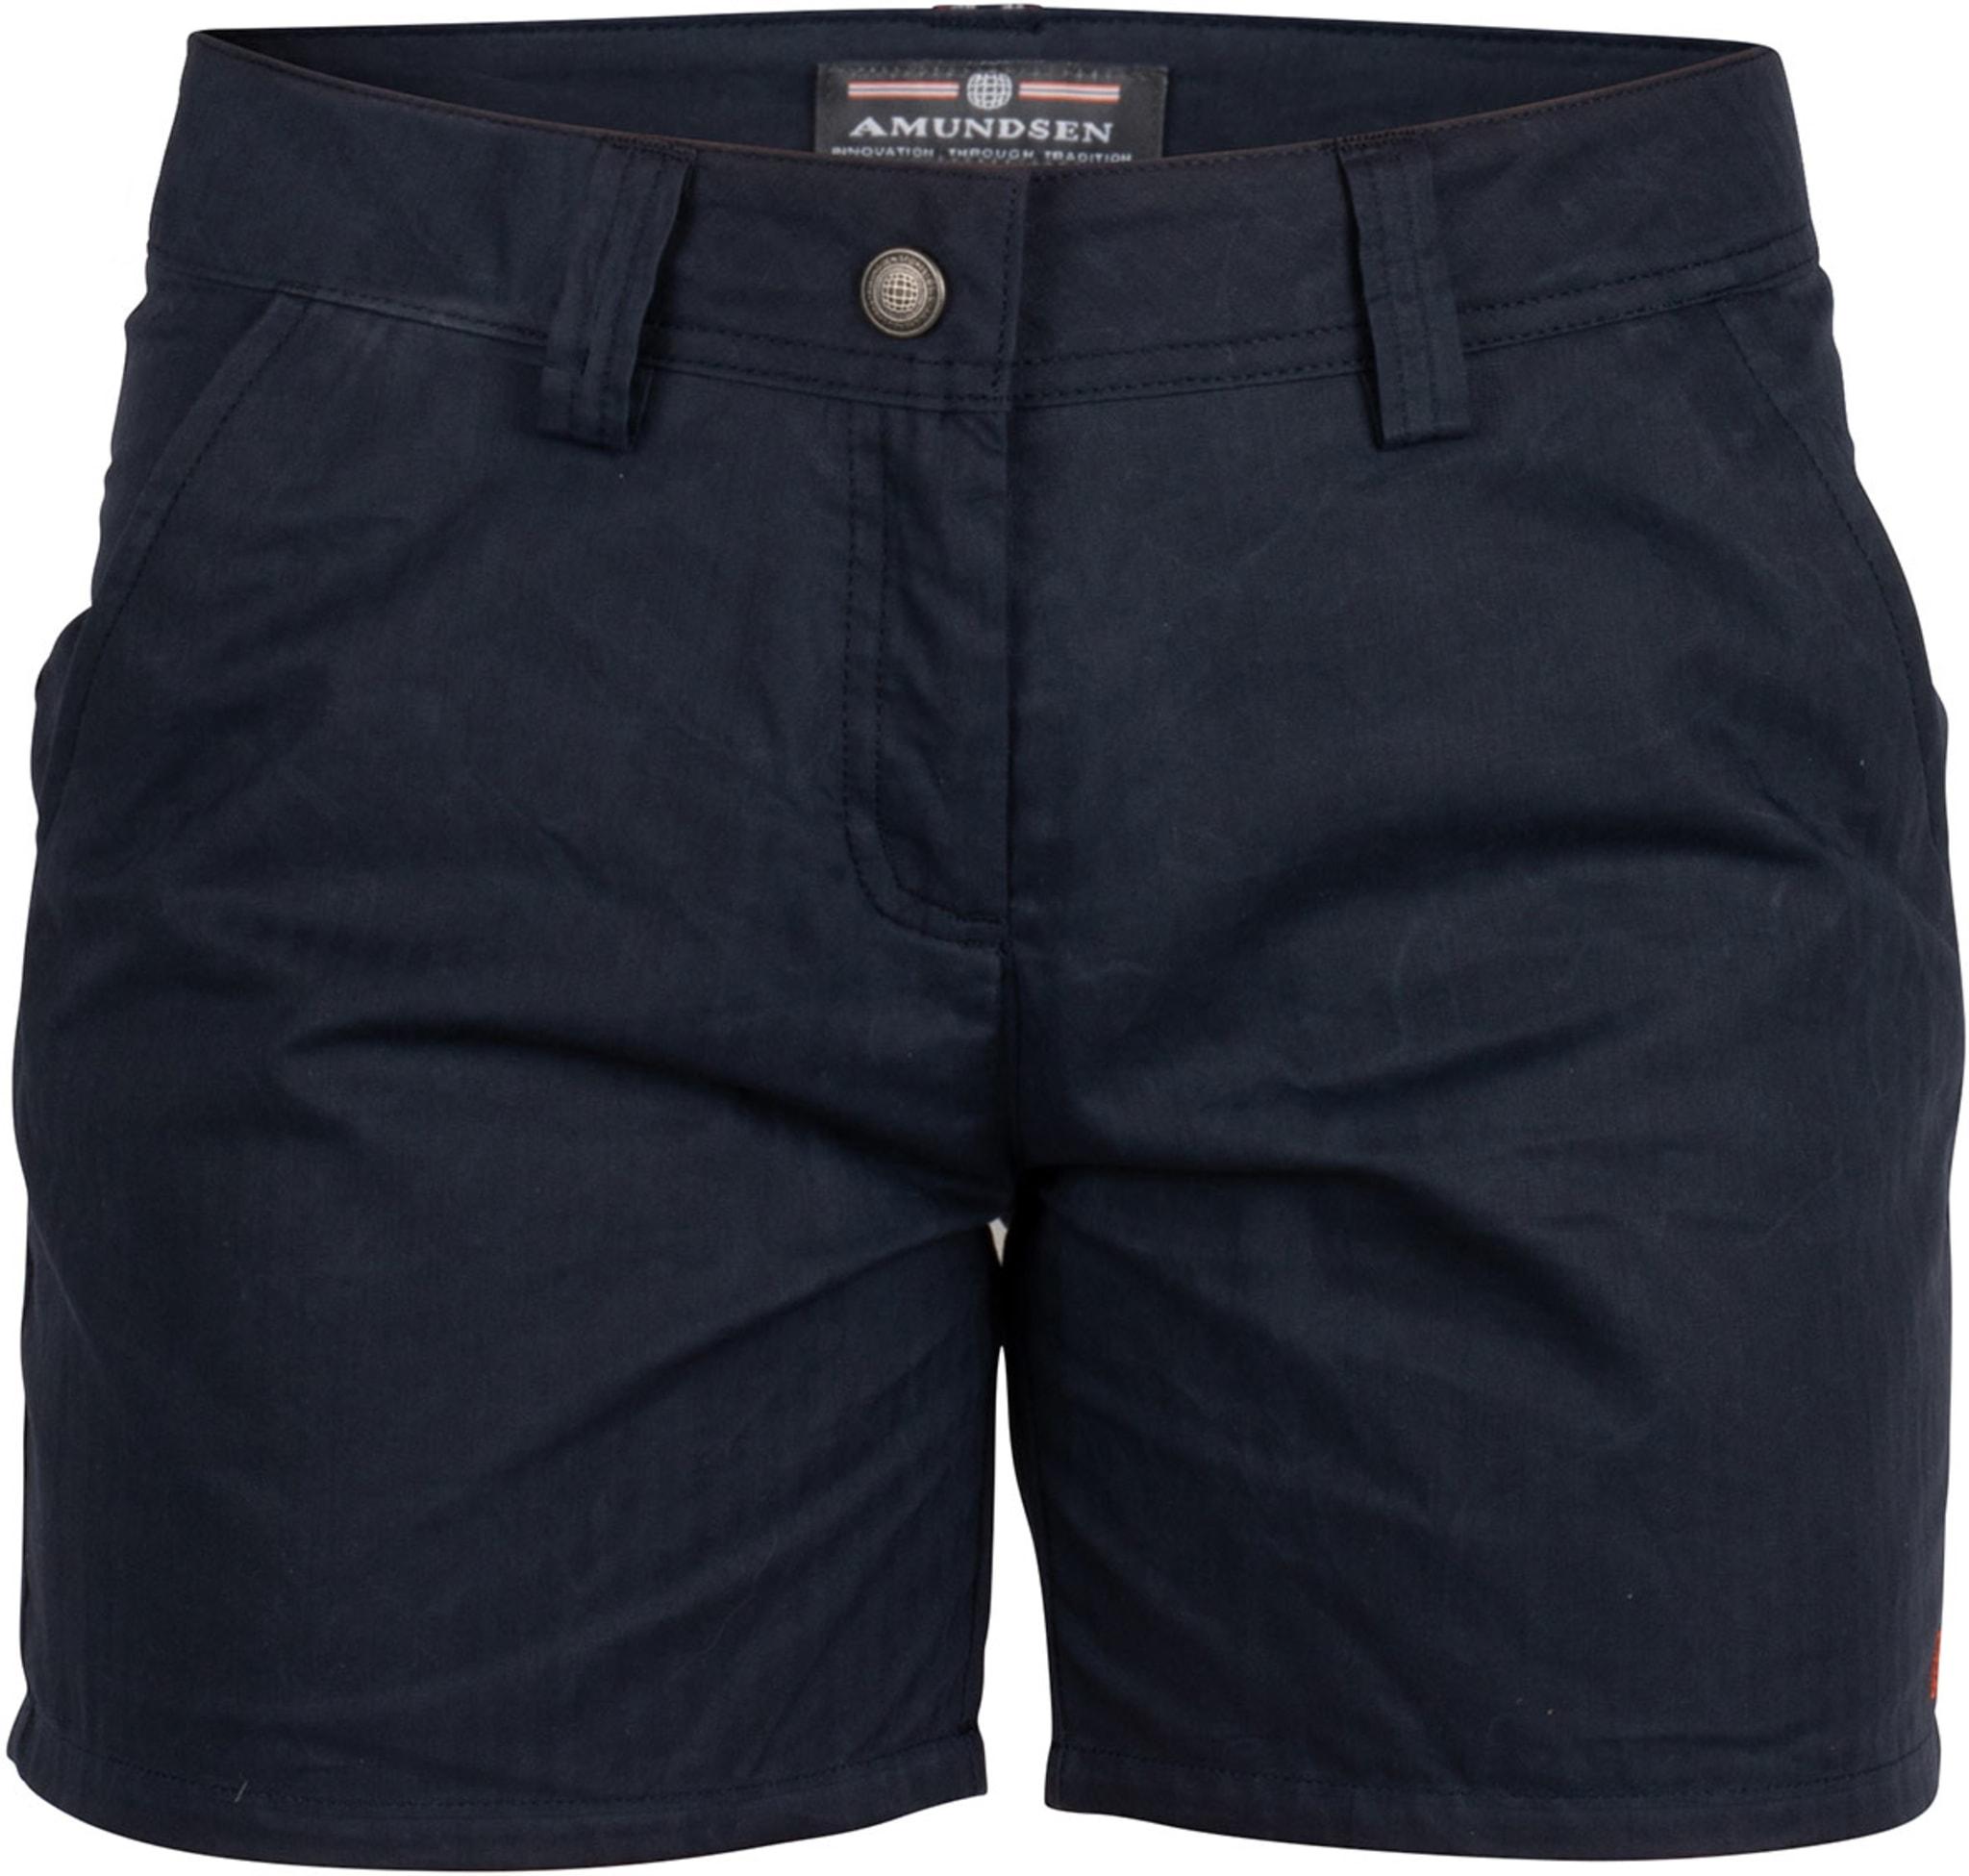 6incher Boulder Shorts W